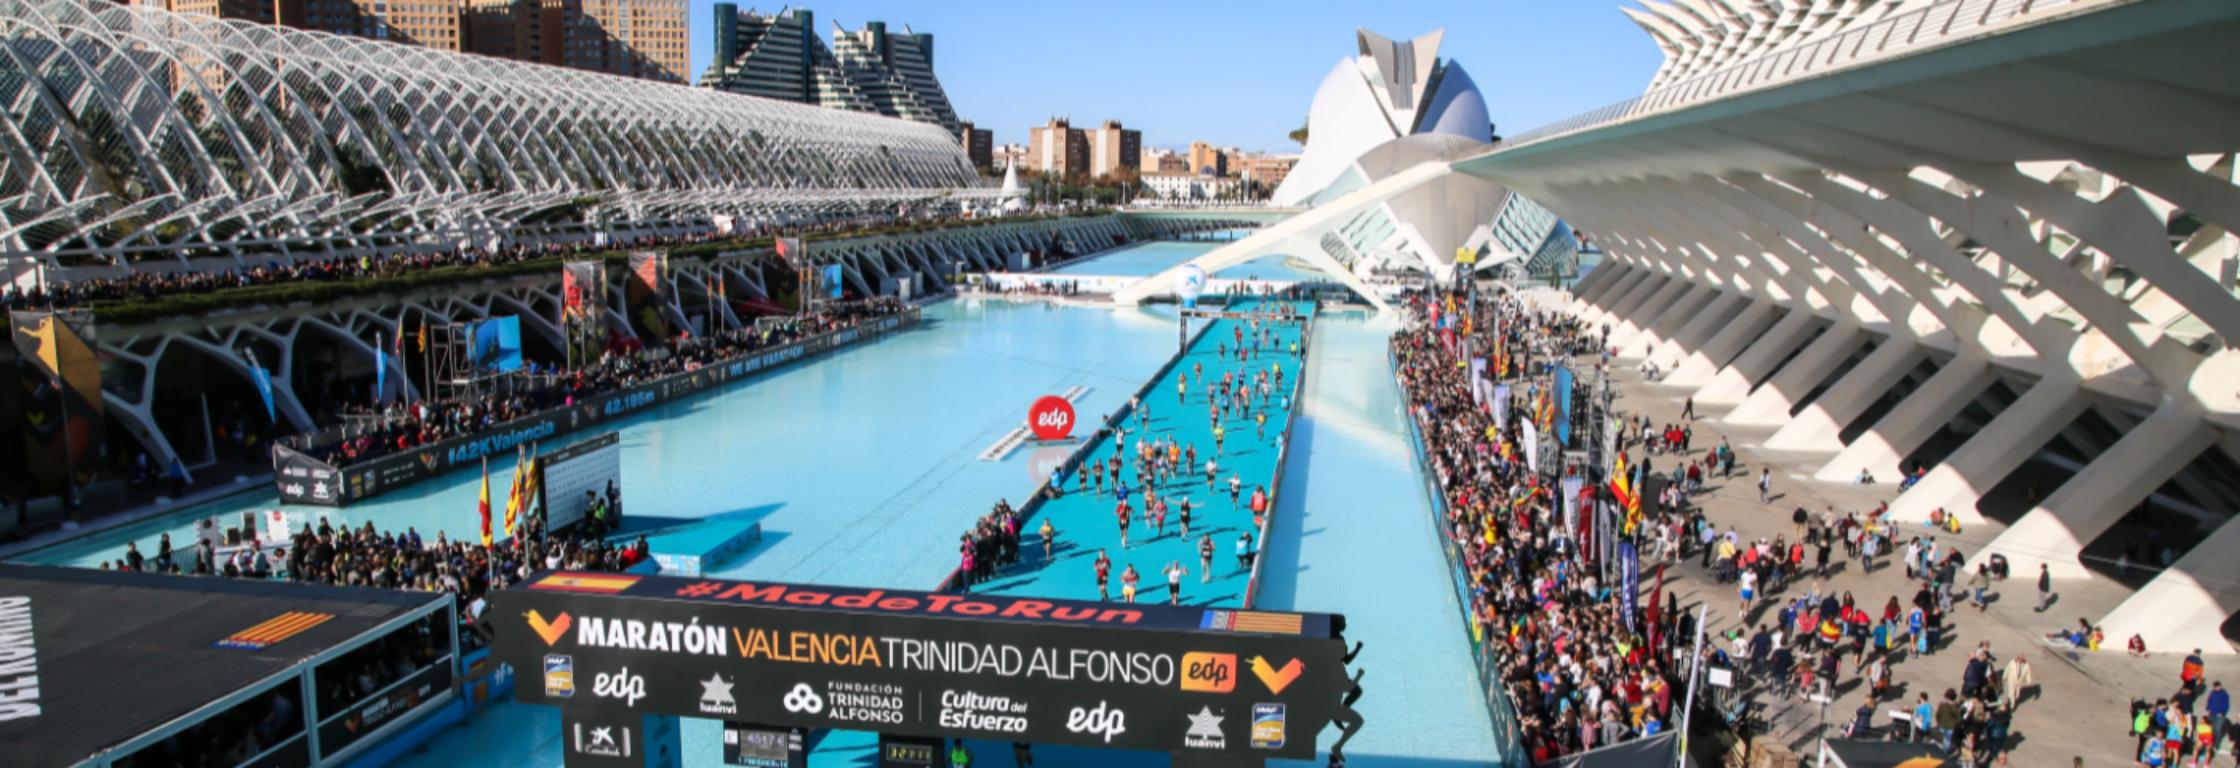 5 redenen om de Valencia Marathon te lopen